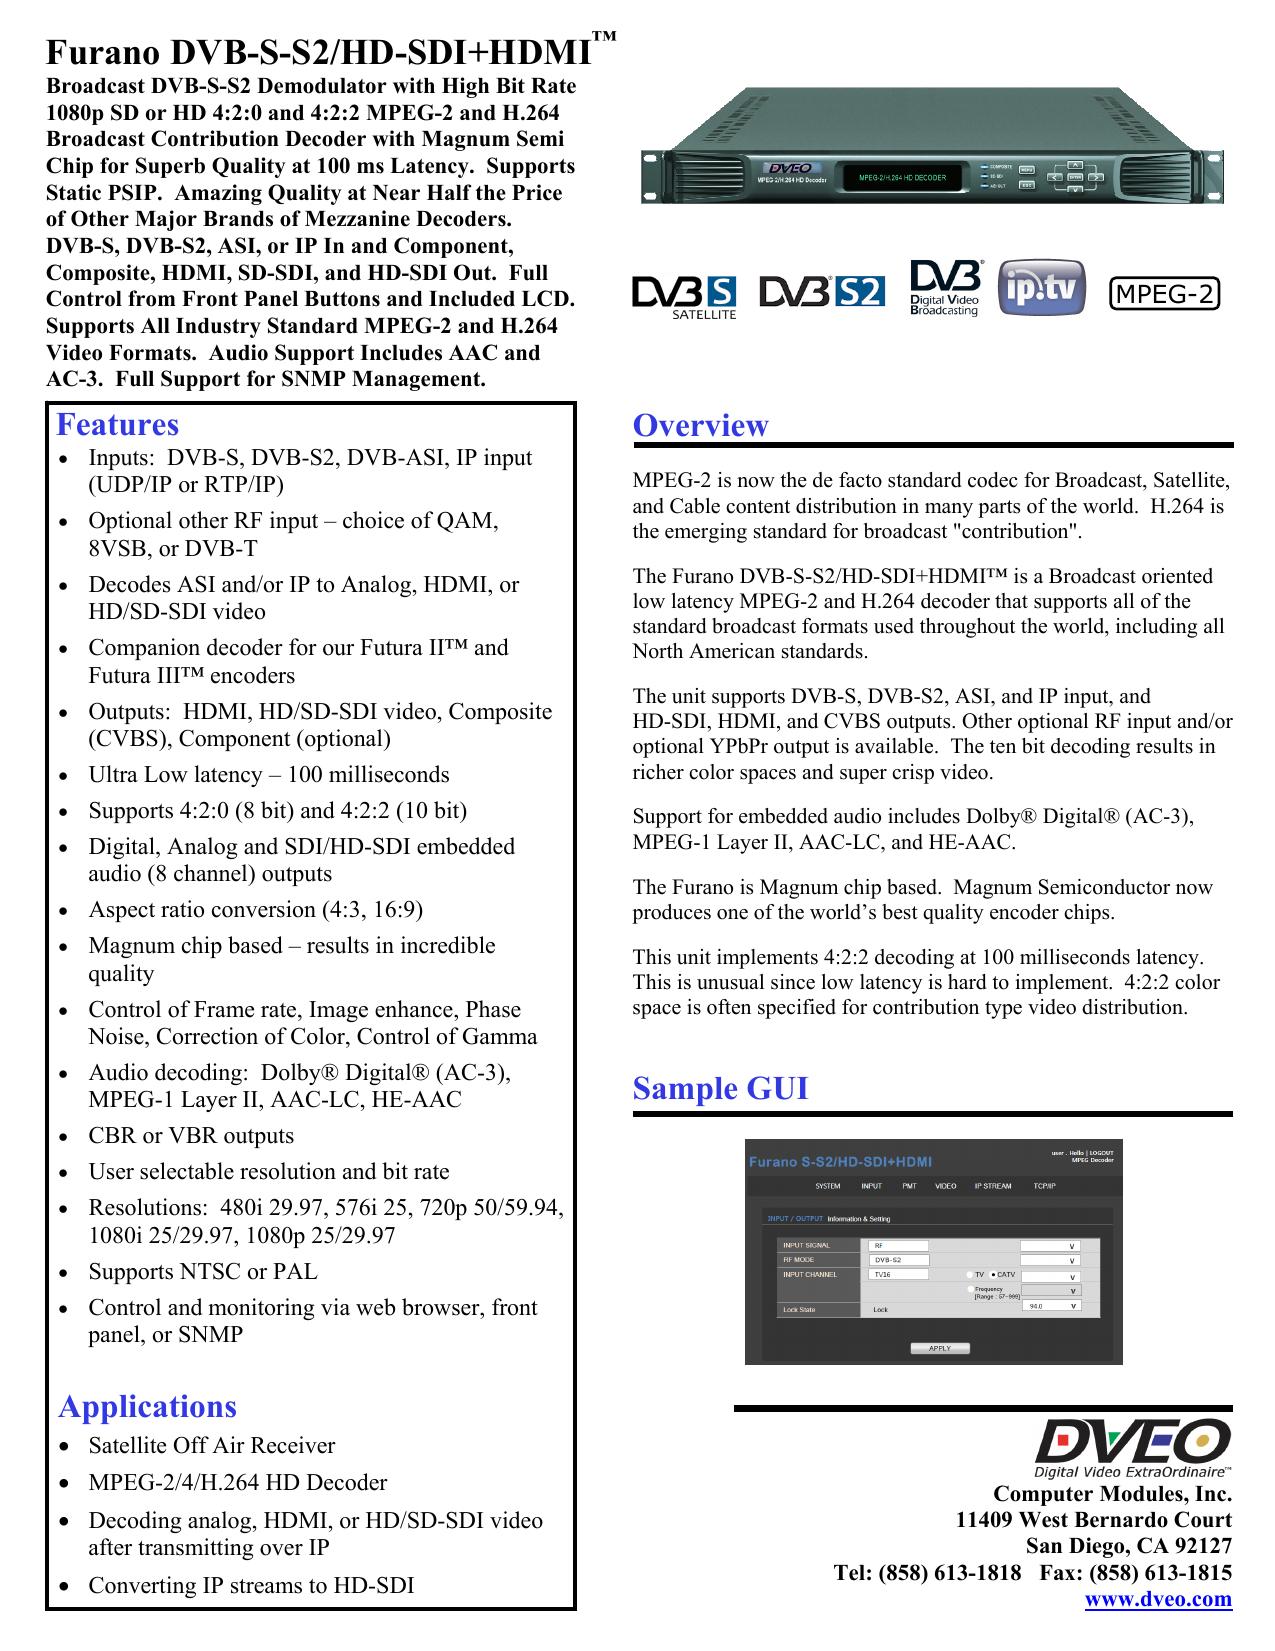 Furano DVB-S-S2/HD-SDI+HDMI -- Low Latency MPEG-2 | manualzz com